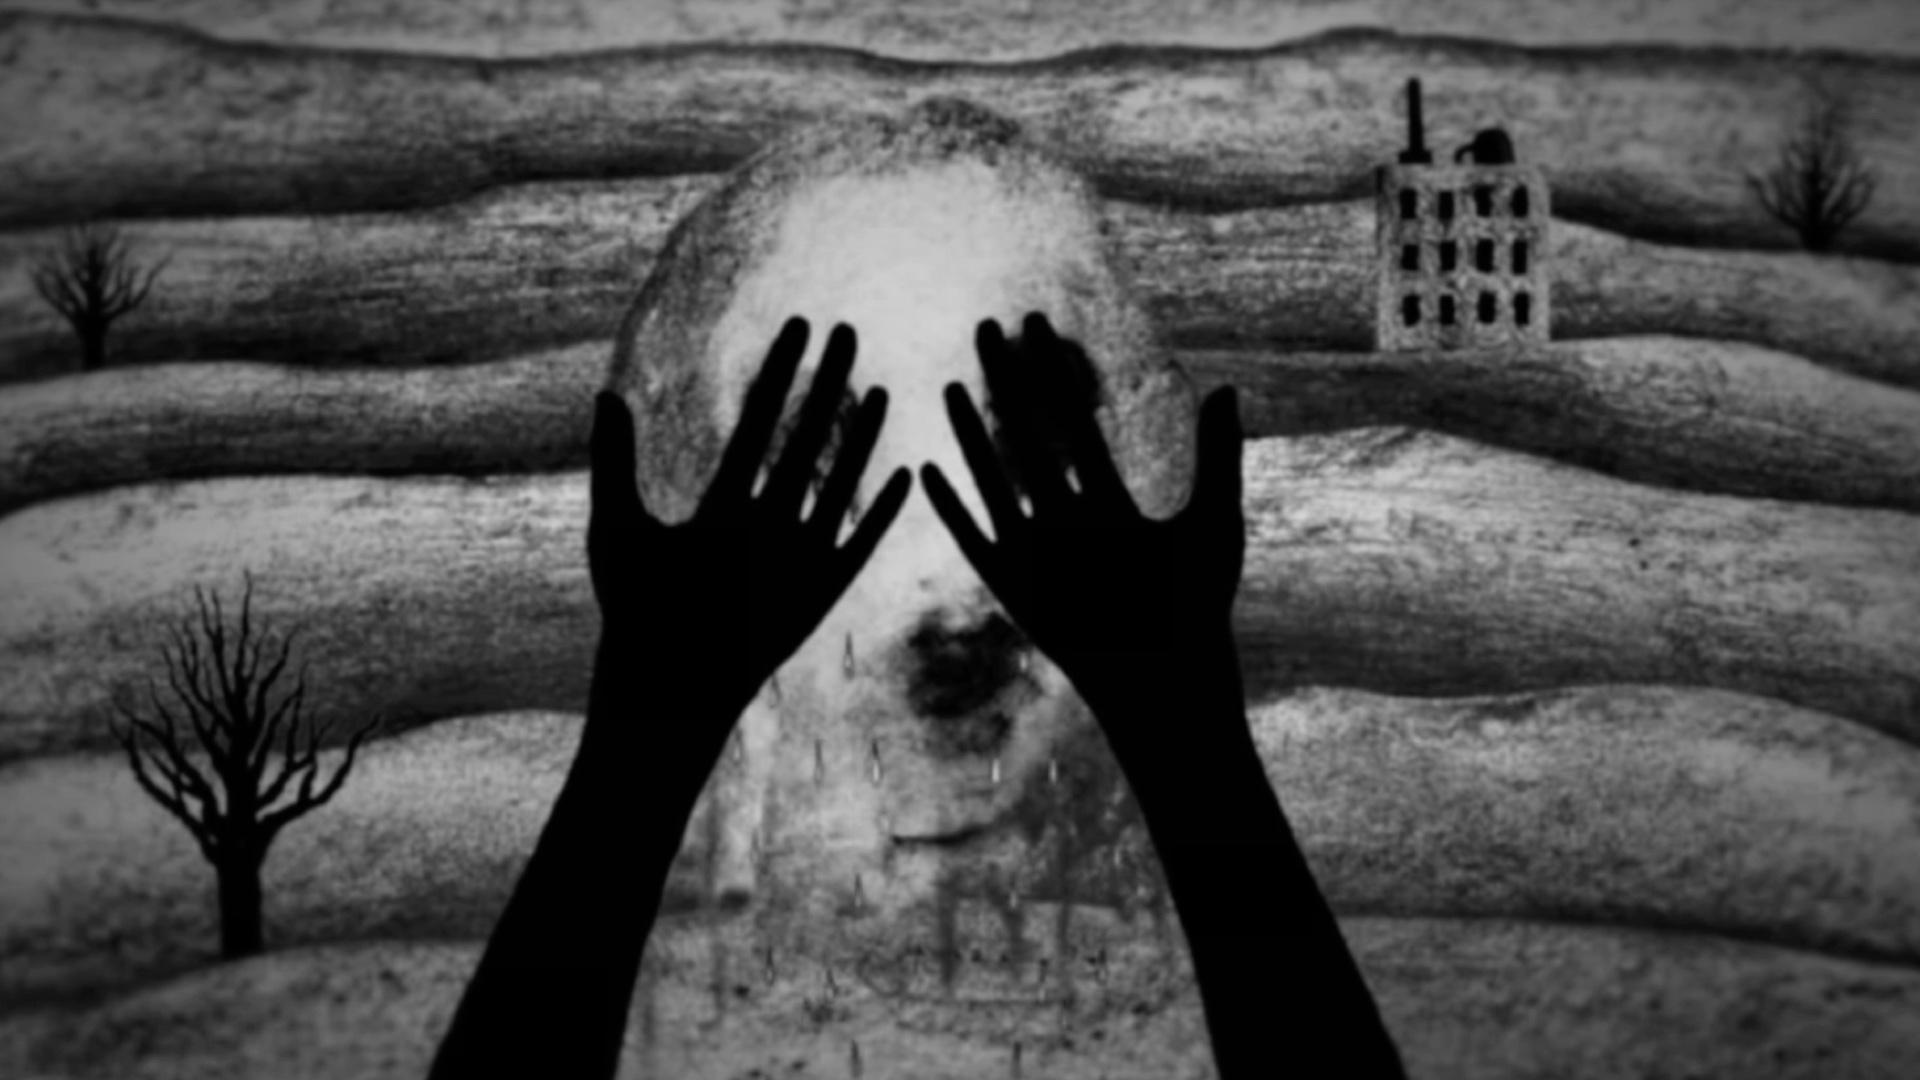 Fire (Pozar), novo curta de David Lynch